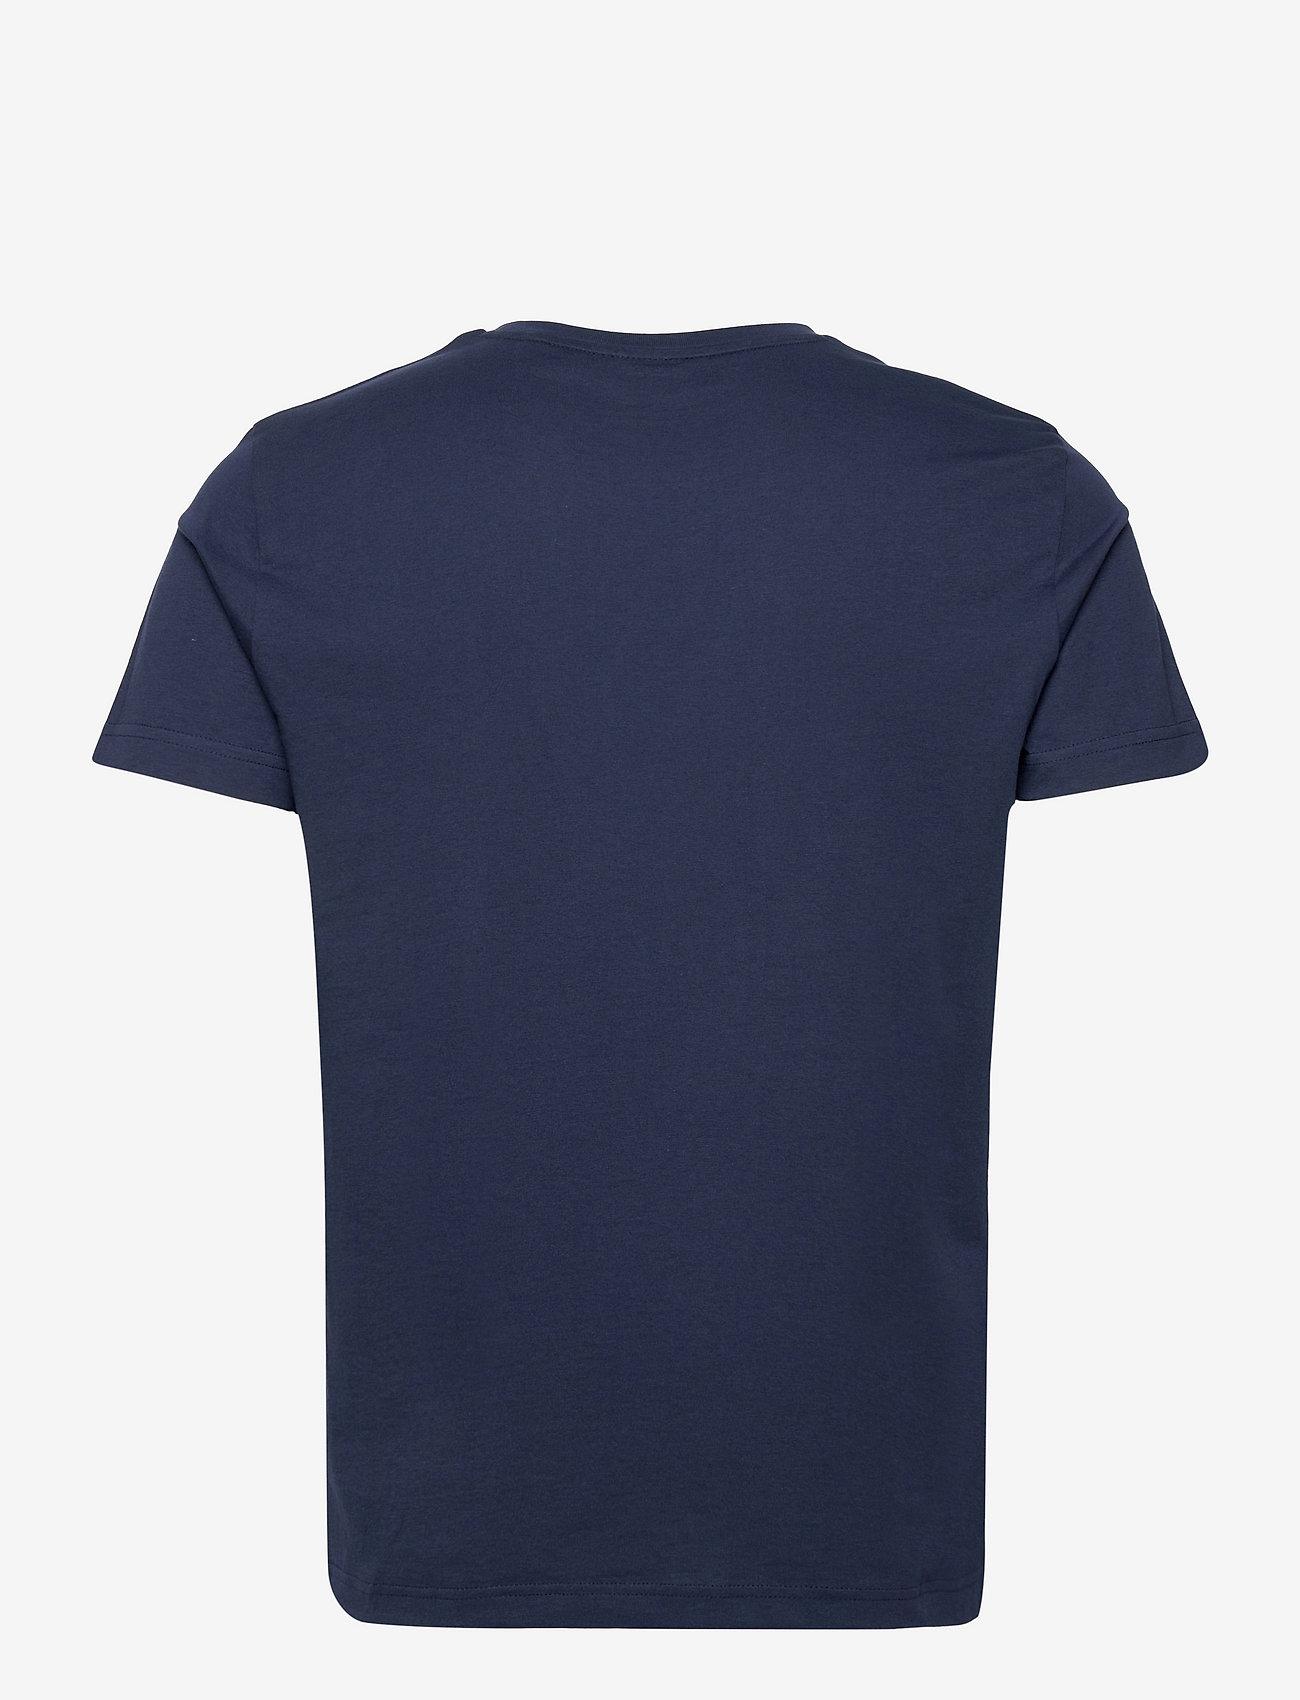 GANT - MD. FALL SS T-SHIRT - short-sleeved t-shirts - evening blue - 1